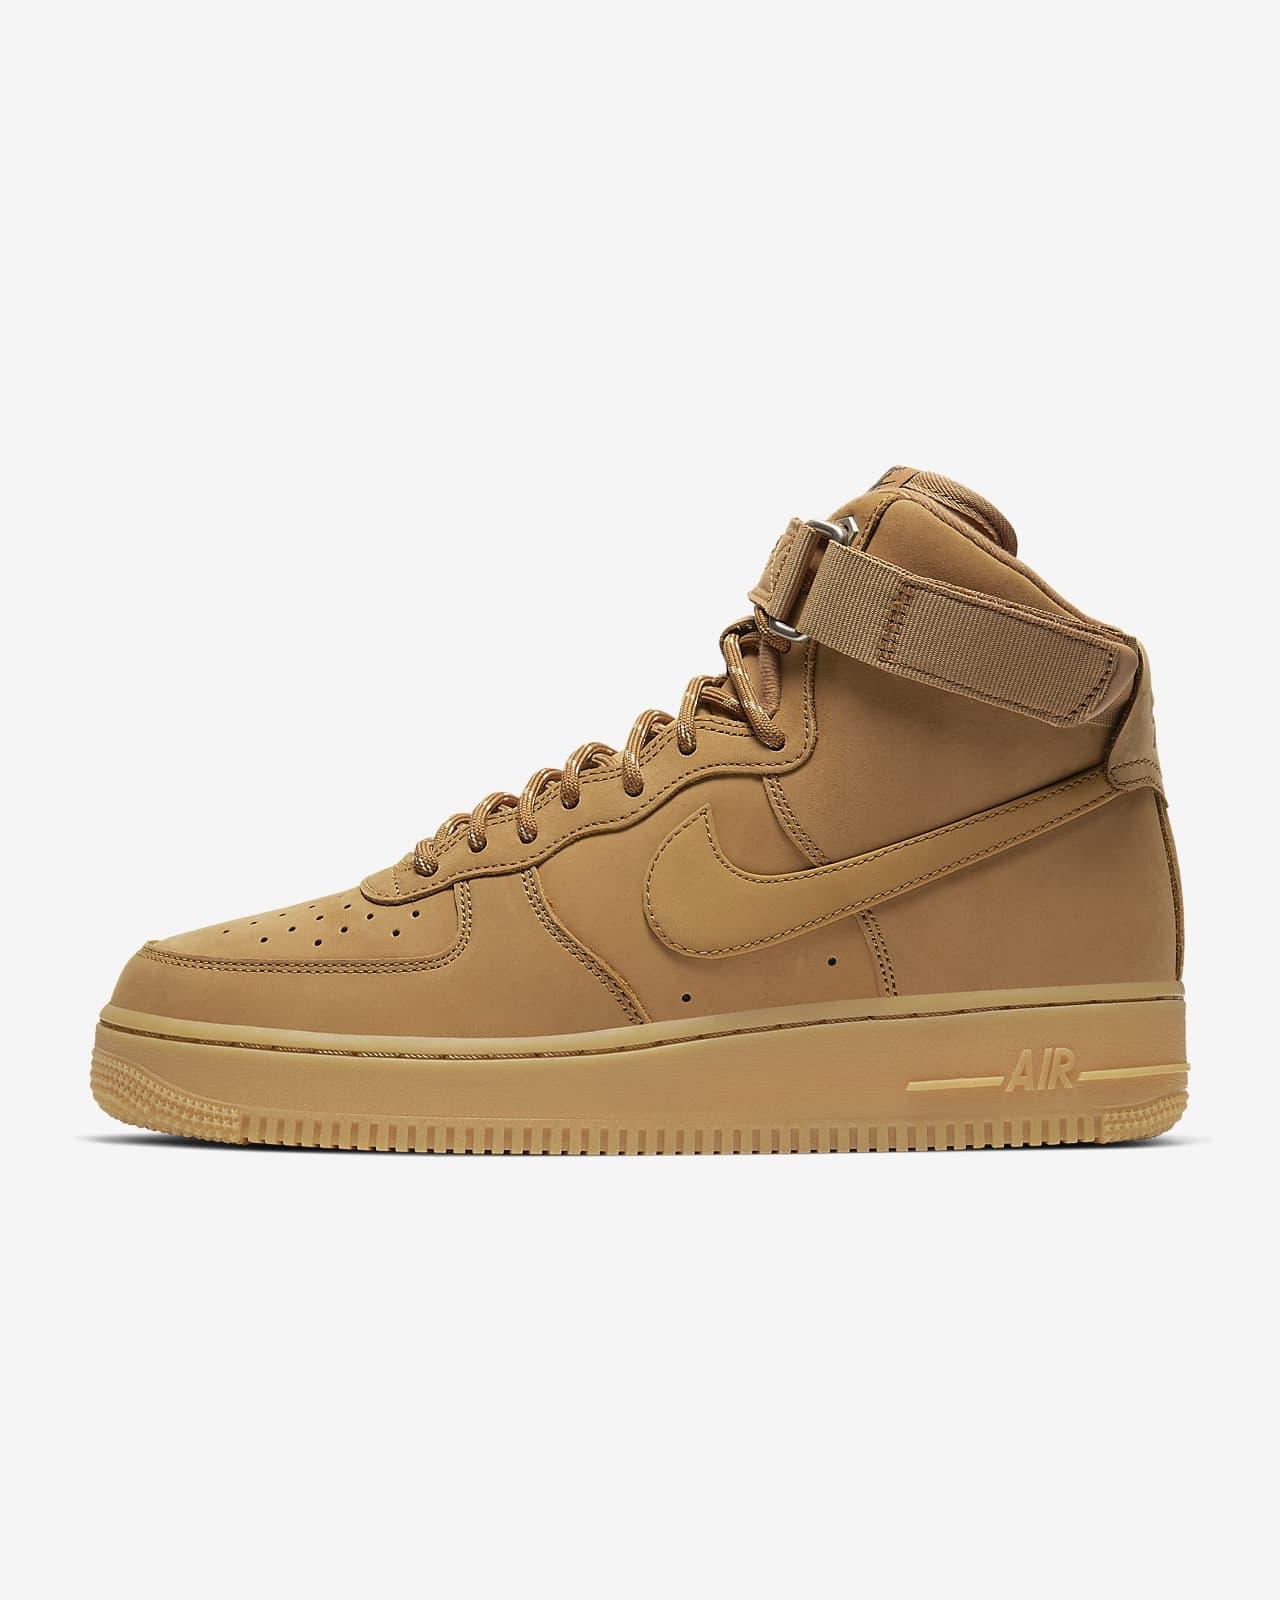 nike air force 1 marron homme,Homme Baskets mode Nike AIR